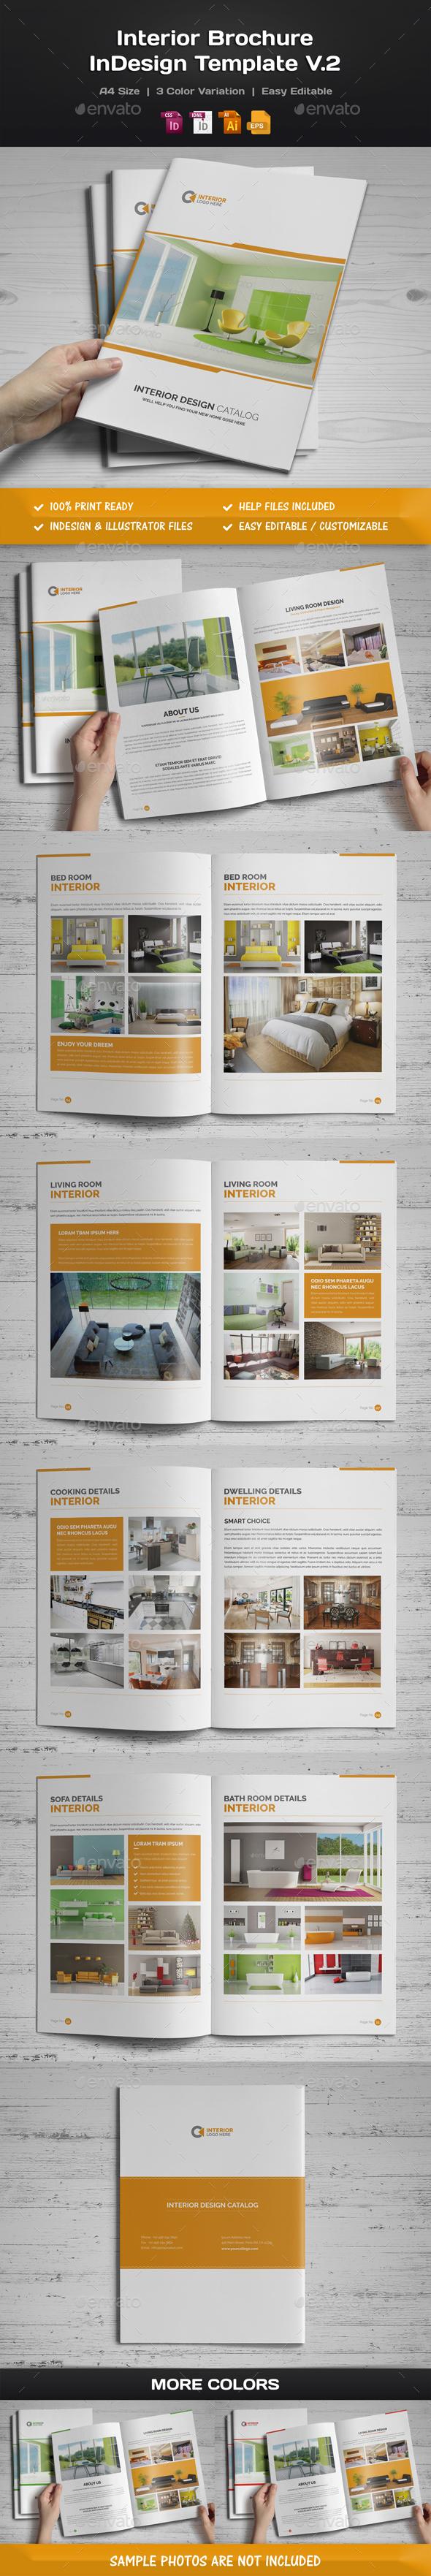 Interior Brochure InDesign v.2 - Corporate Brochures